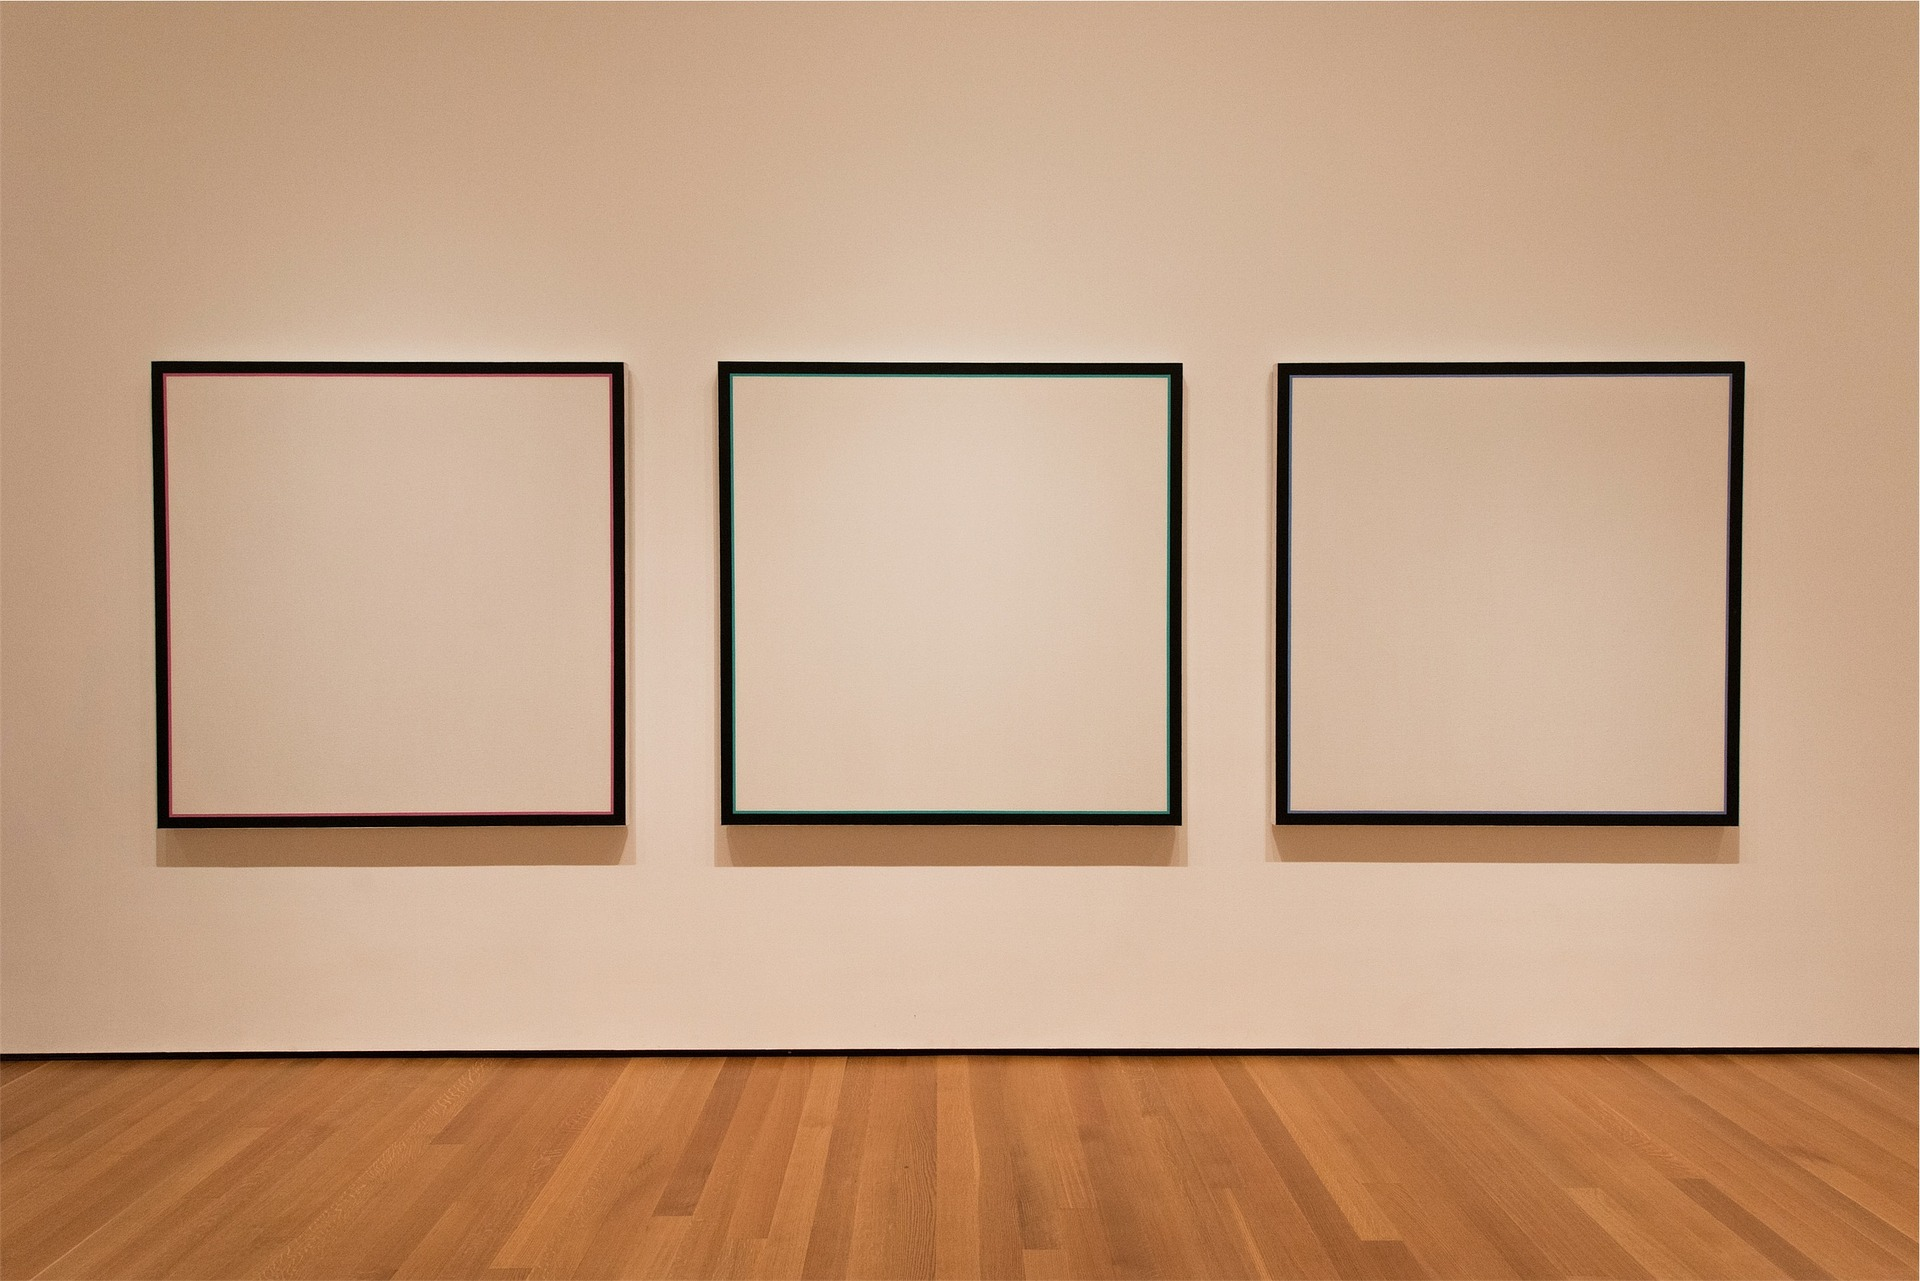 art-gallery-699429_1920